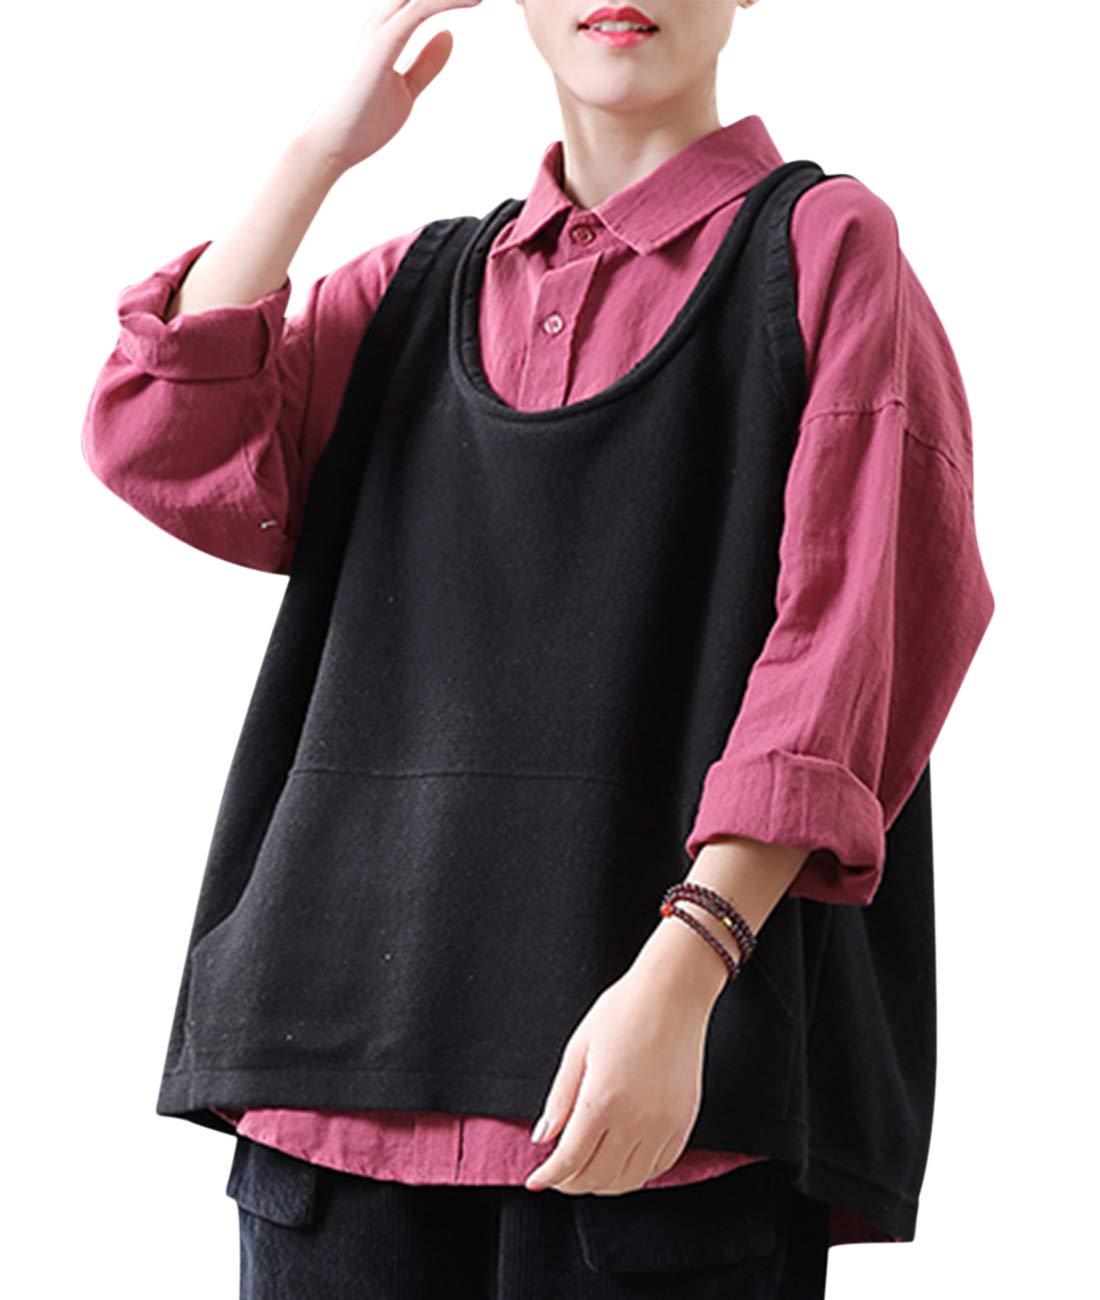 YESNO LD7 Women Casual Cute Sweater Vest Loose Swing Hemline/Pockets (L, LD7 Black) by YESNO